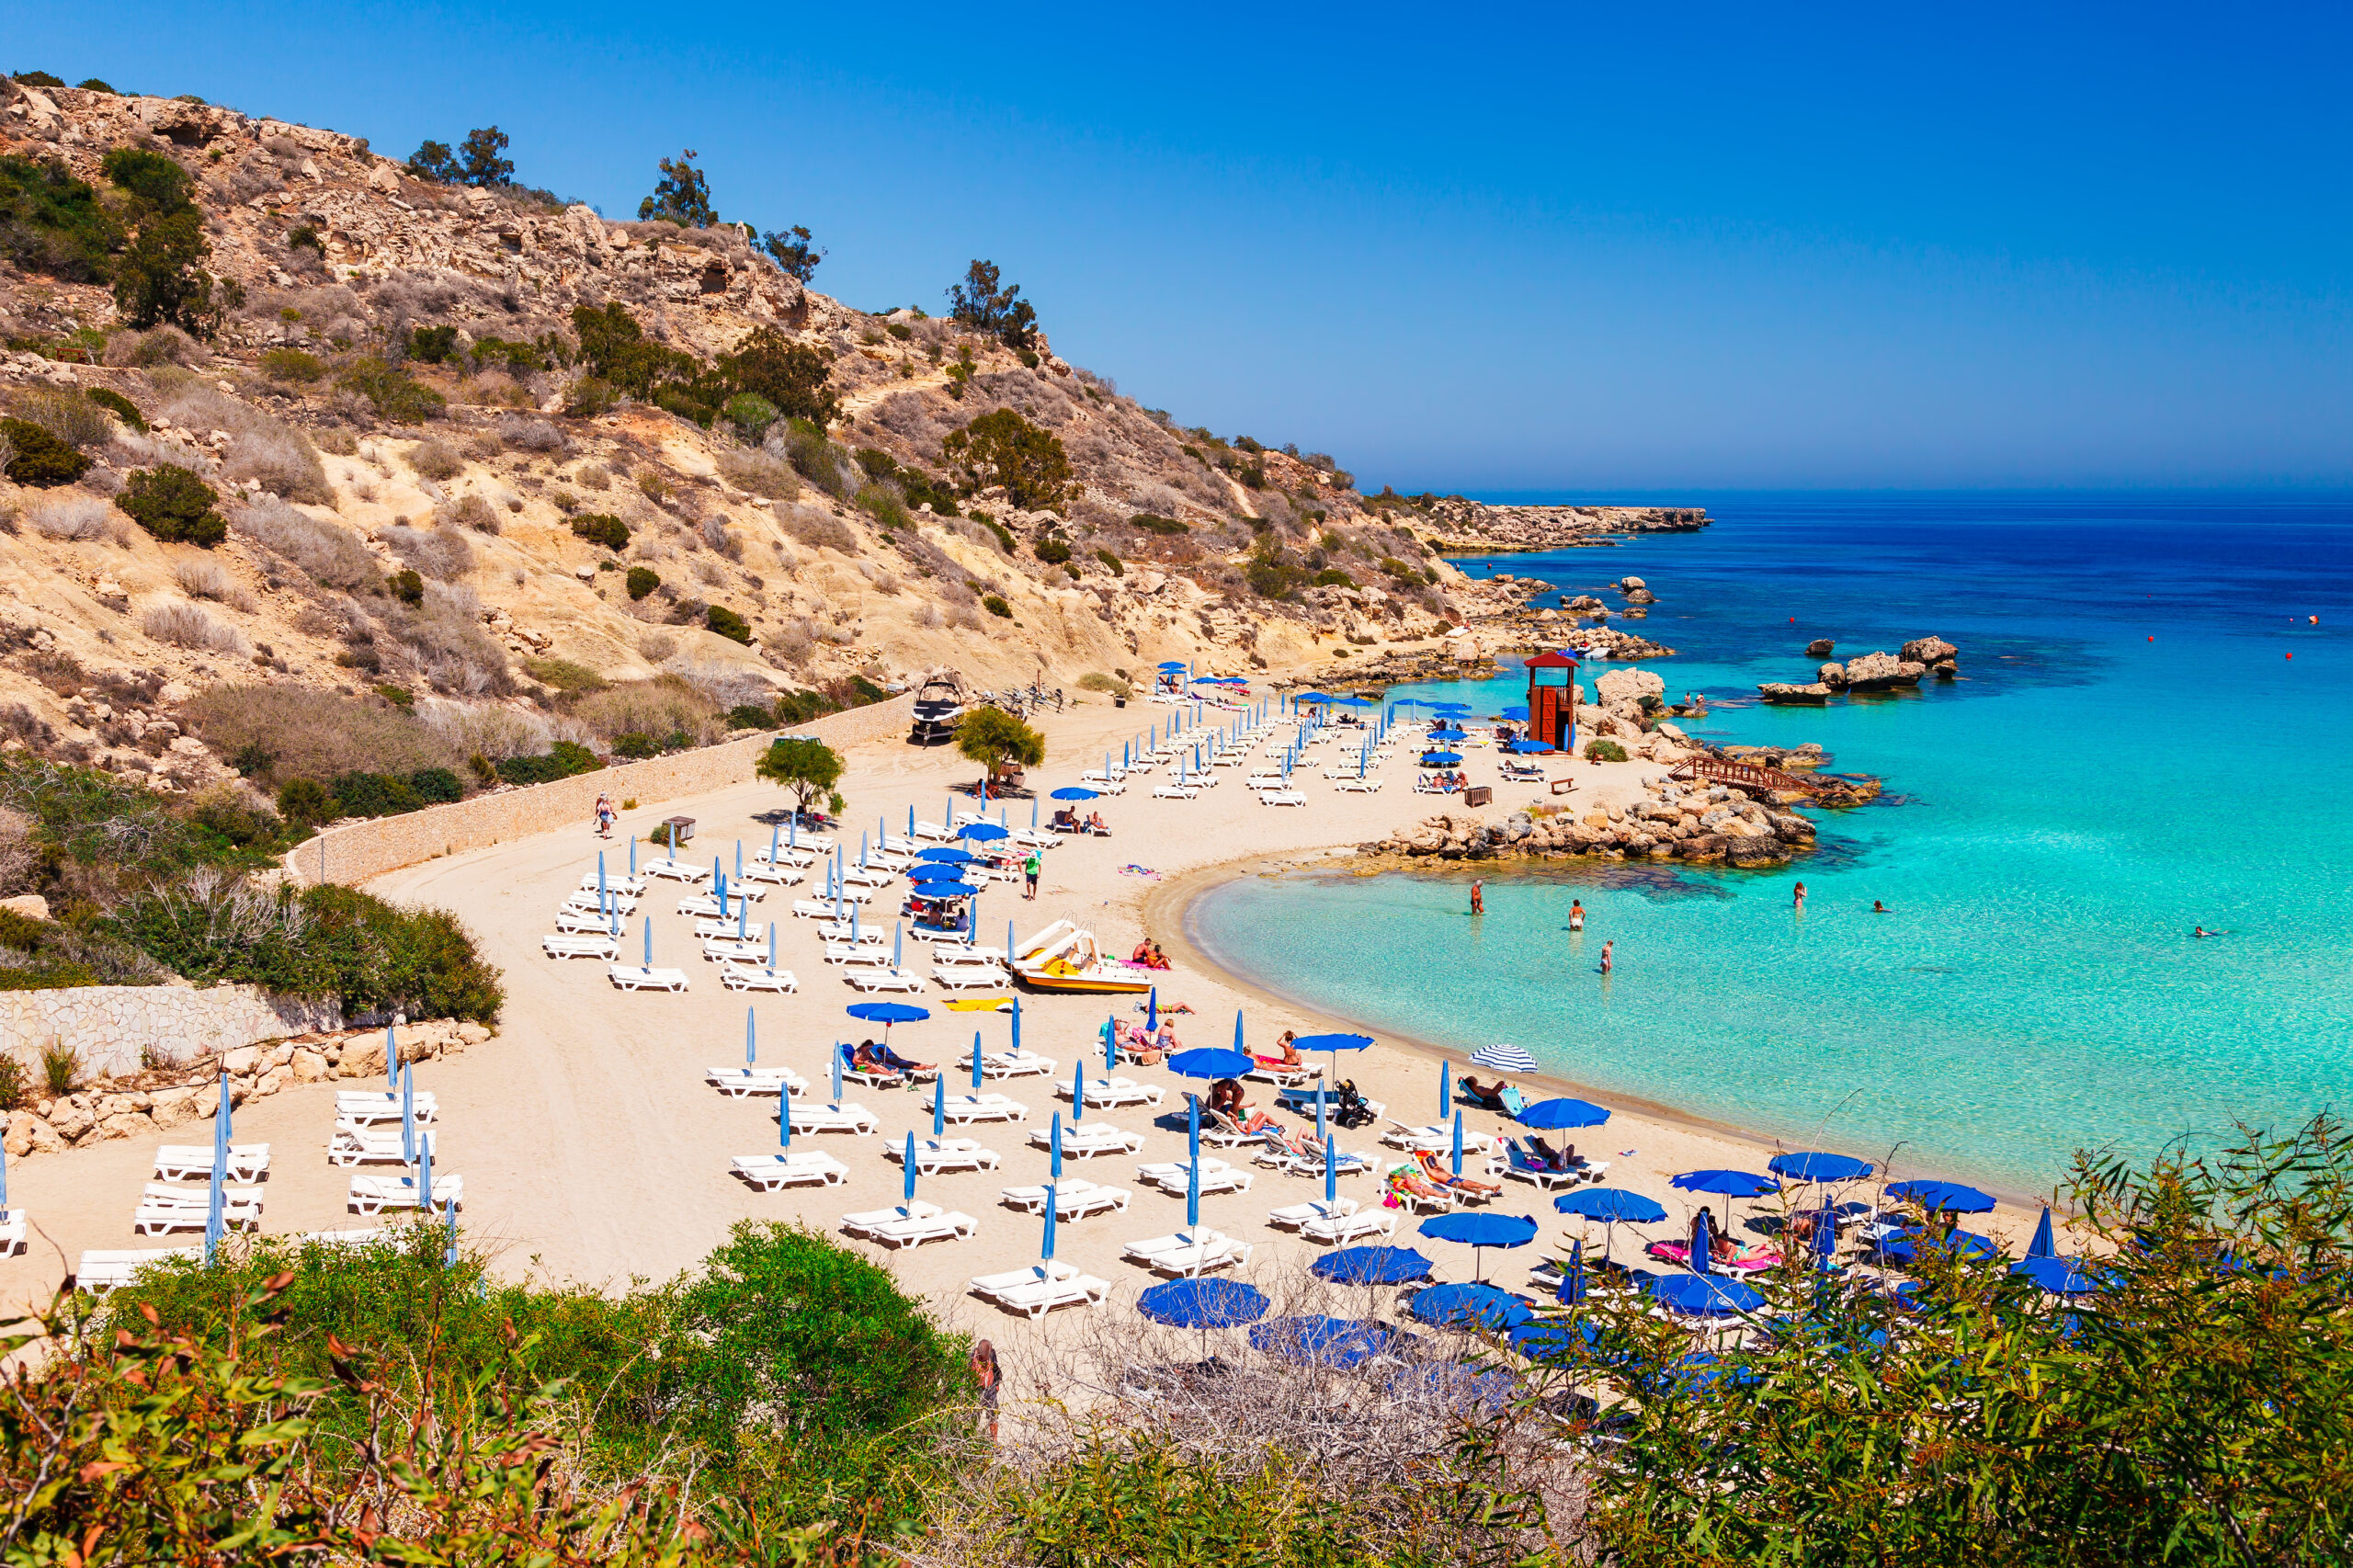 Nissi beach and Cavo Greco in Ayia Napa, Cyprus